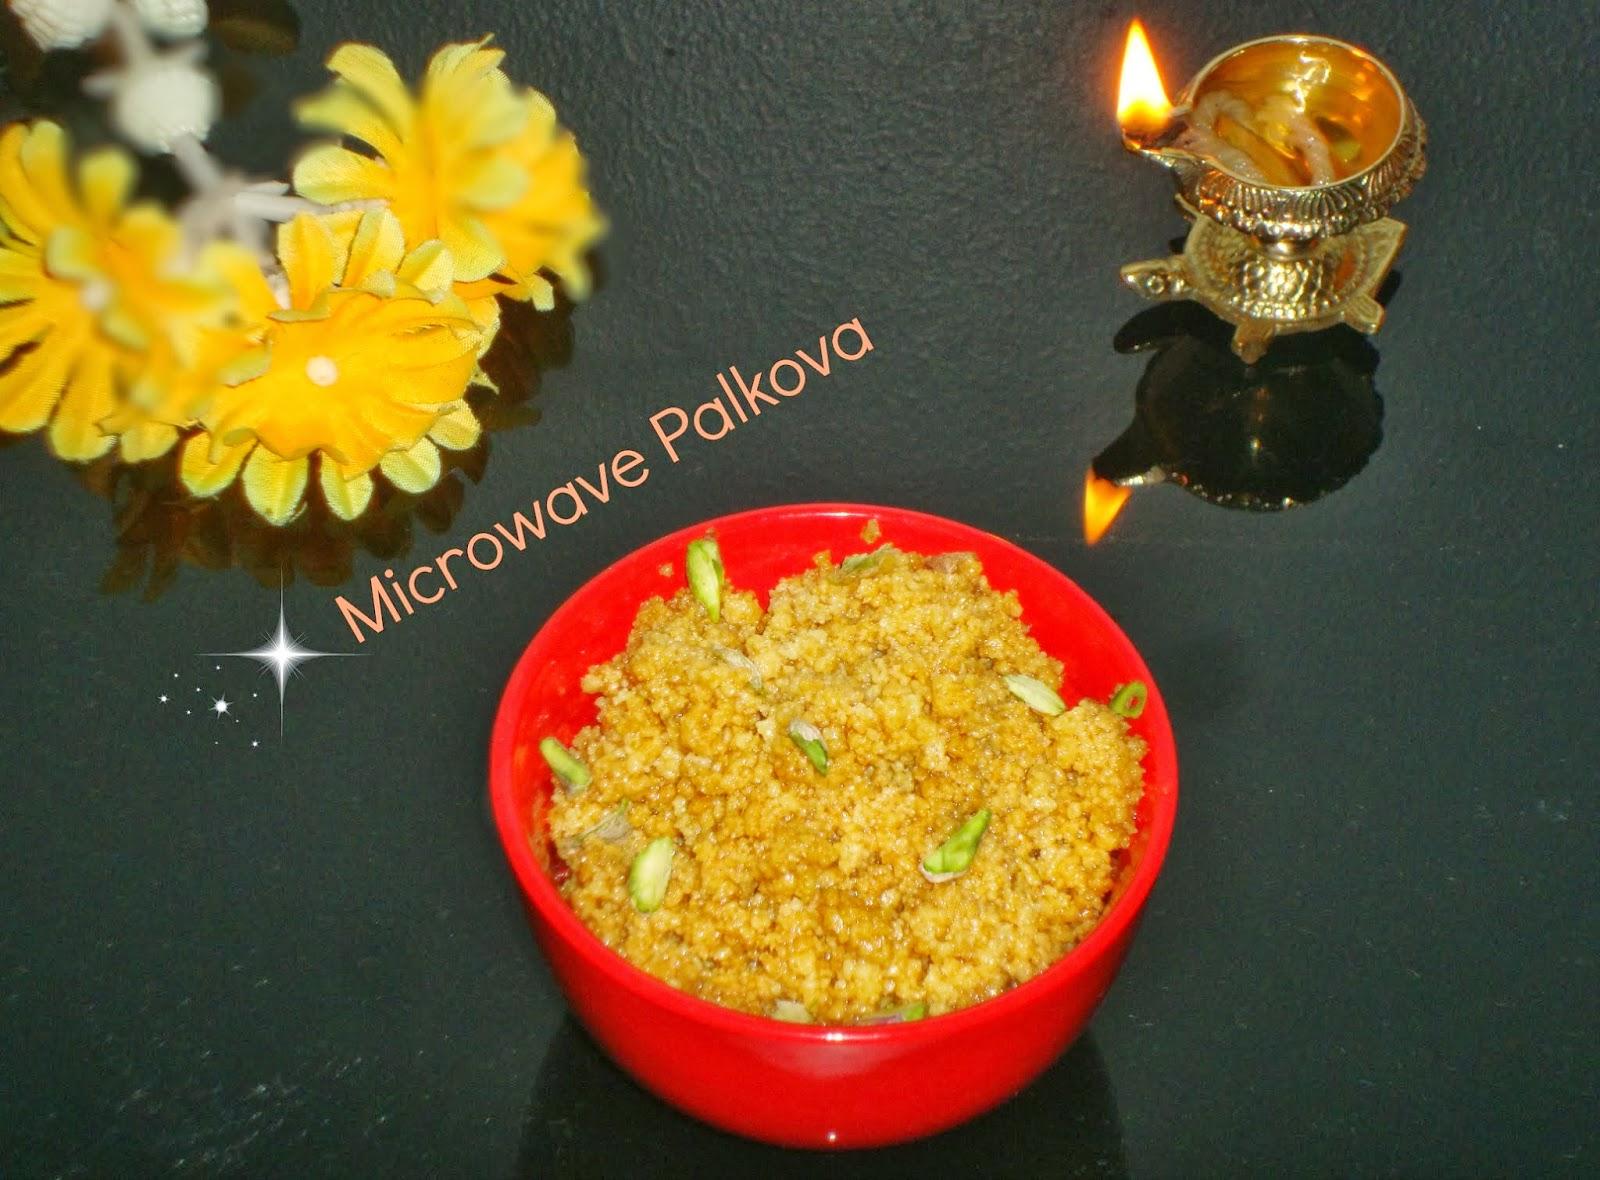 Poornima S Cook Book Microwave Palkova 10 Minutes